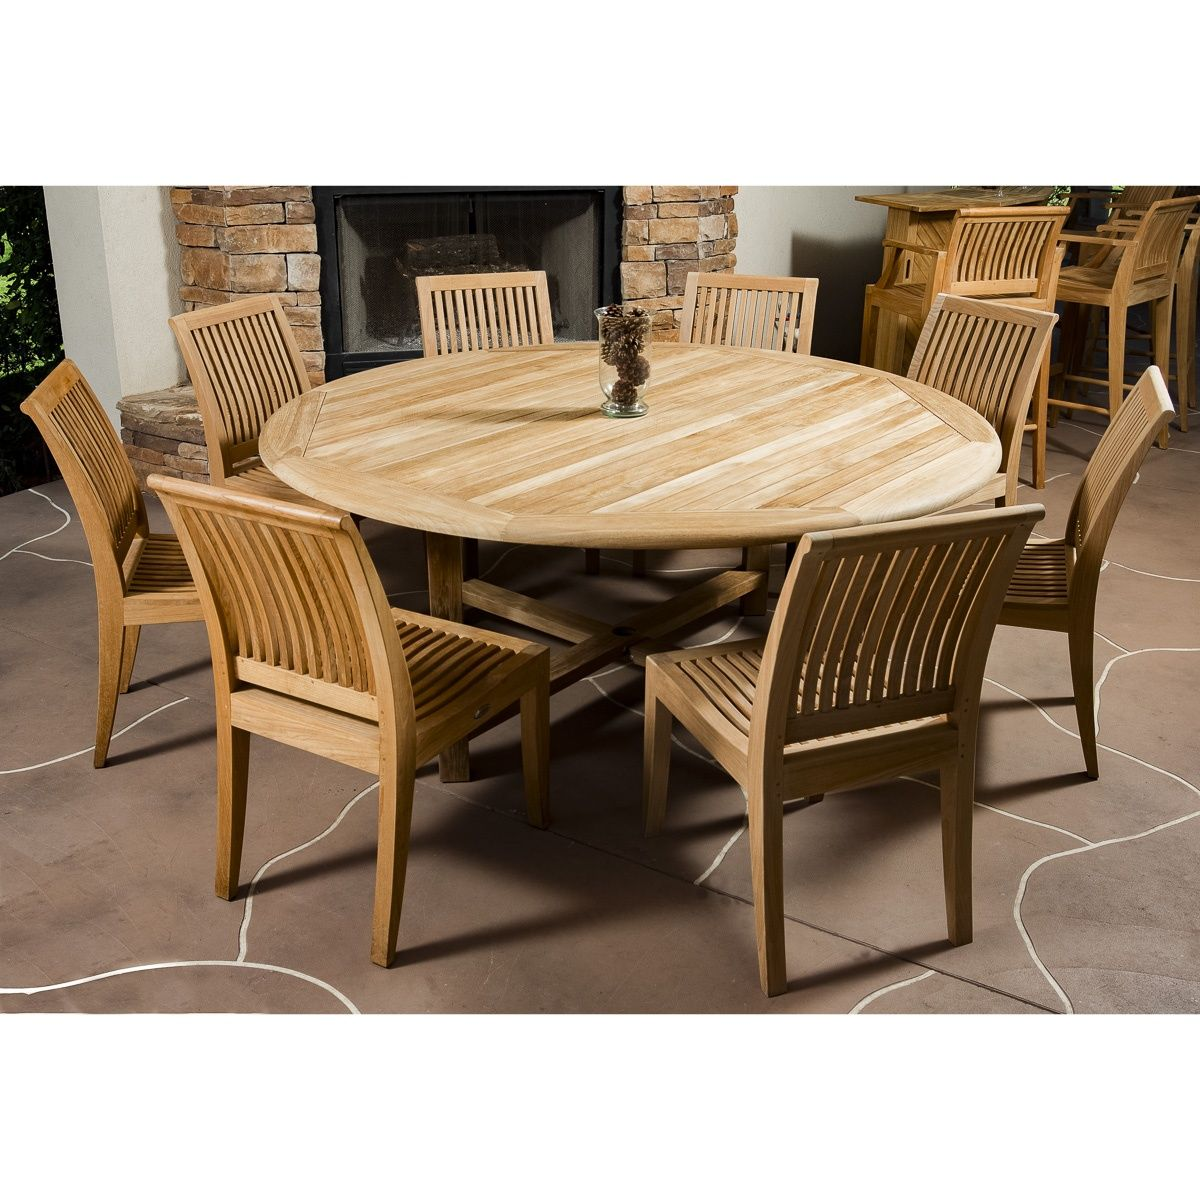 9pc Teak Round Table Dining Set Teak Outdoor Furniture Luxury